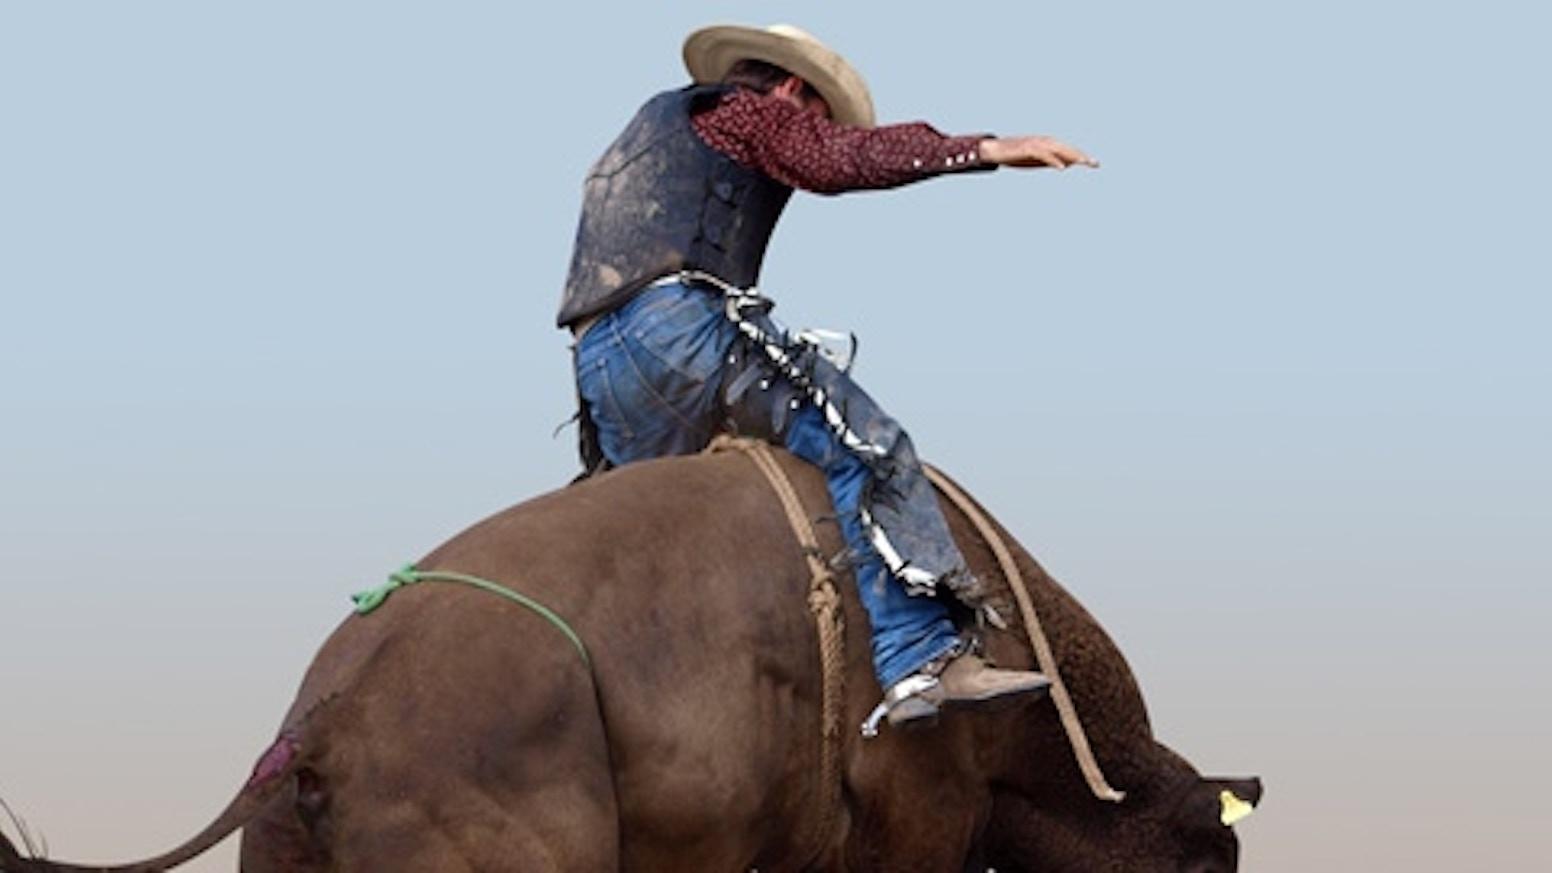 A story about a cowboy